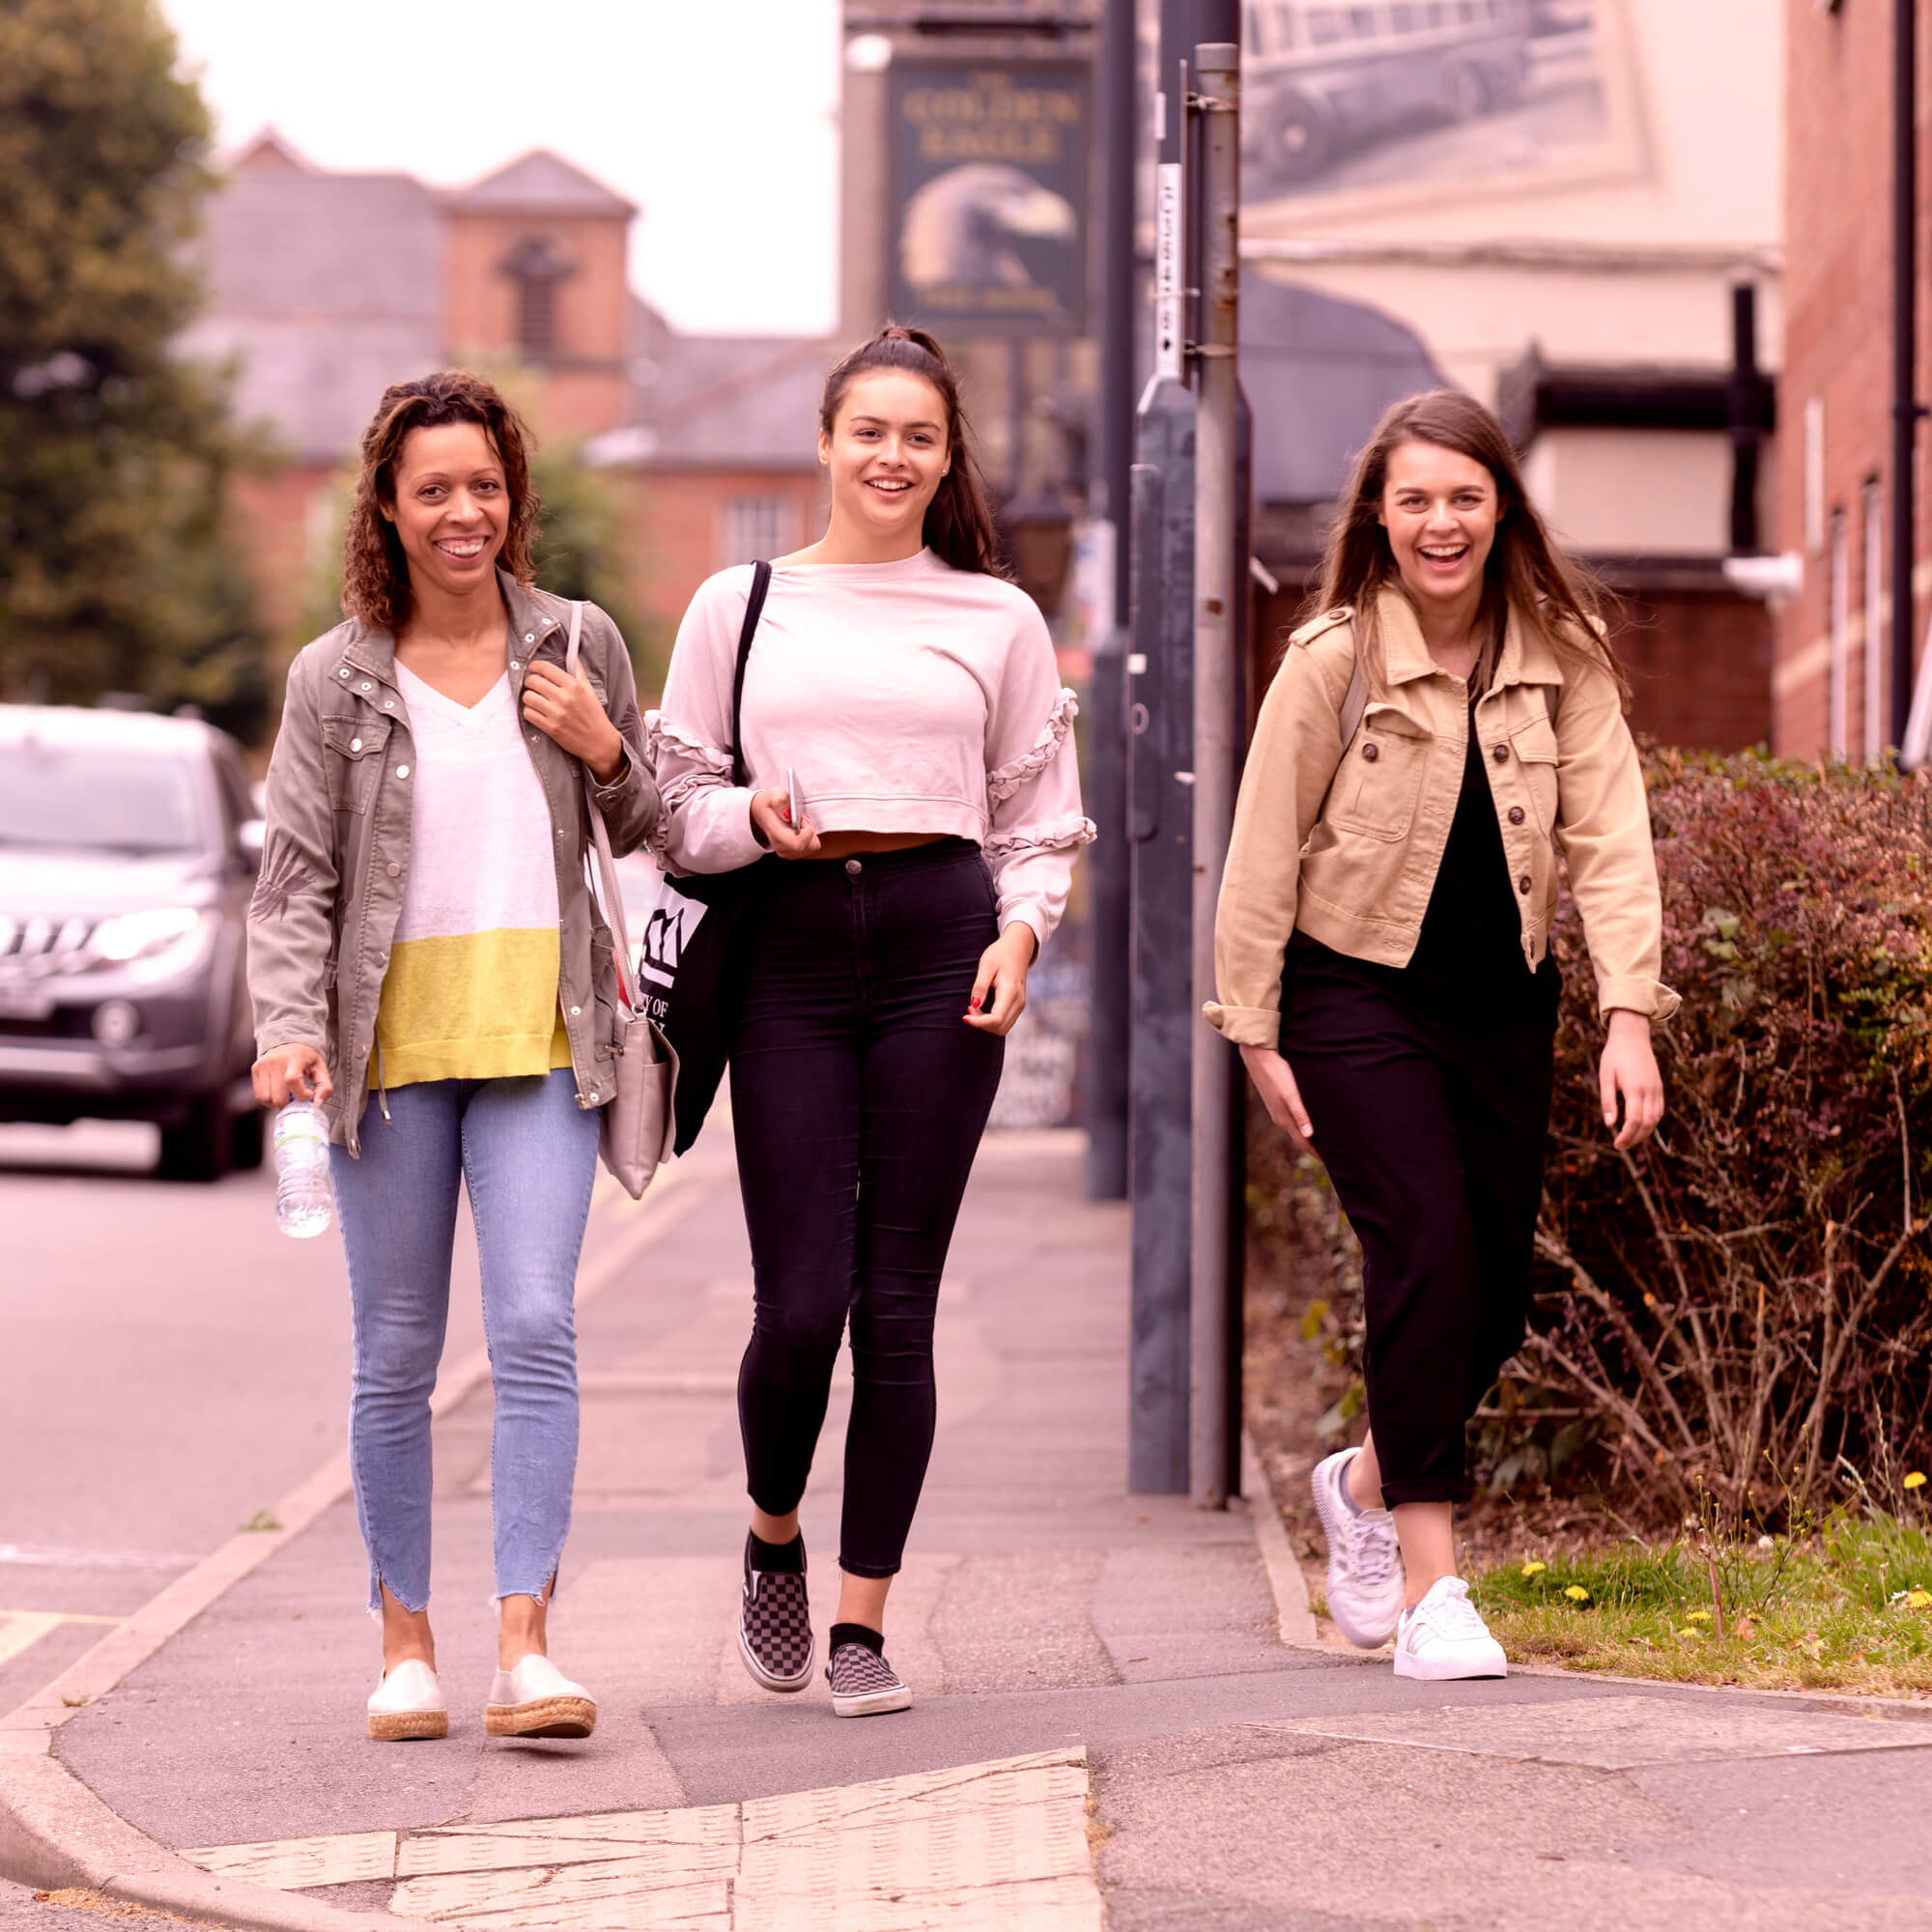 Three students walking through Derby